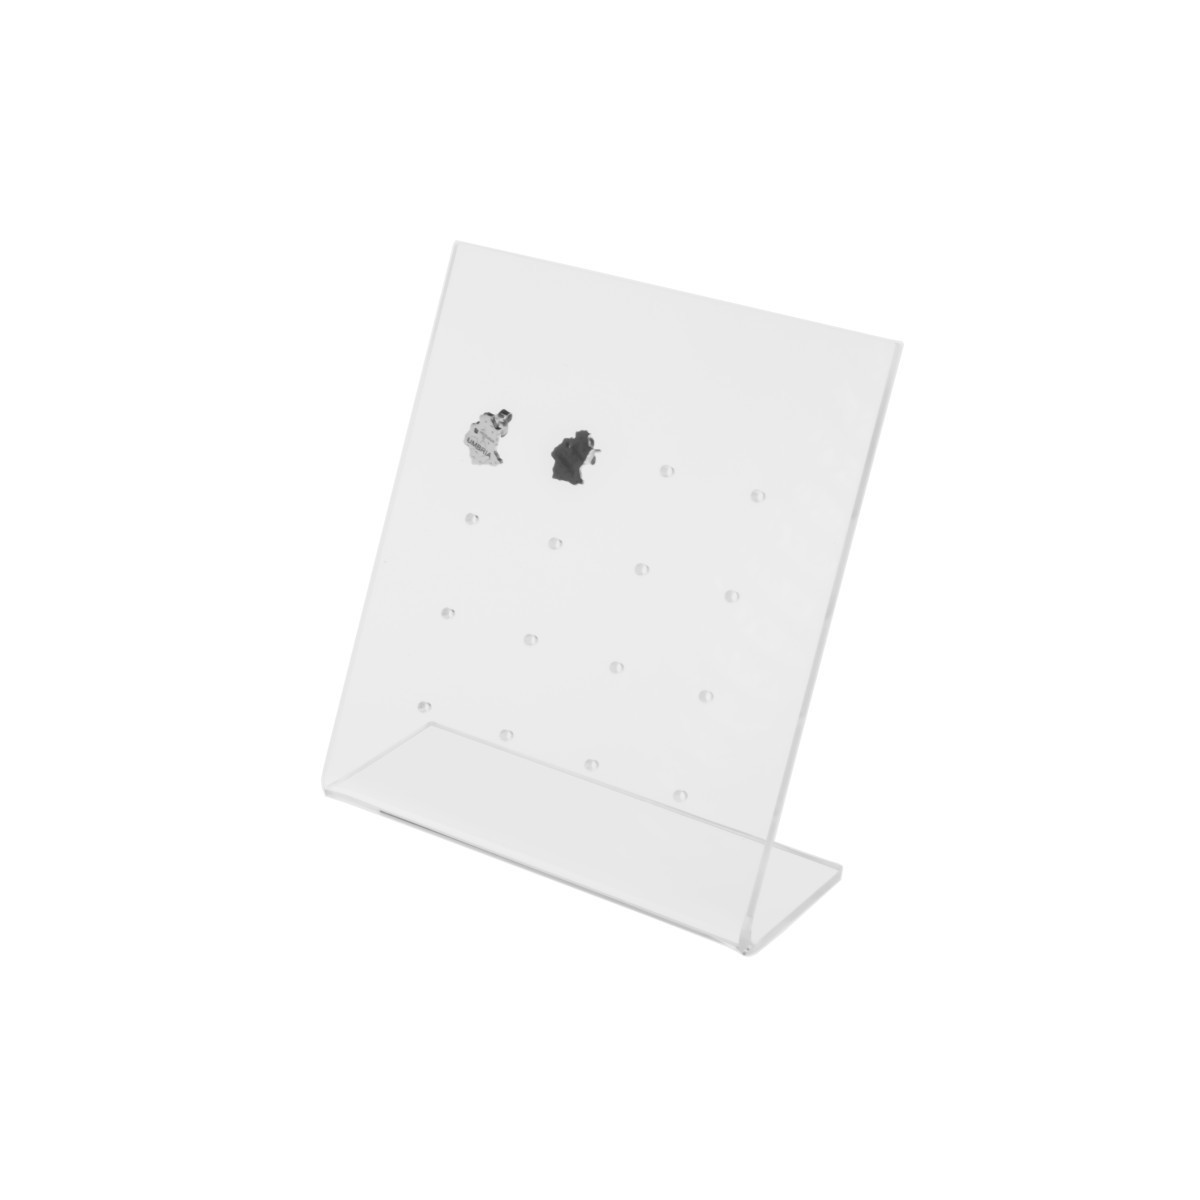 Expositor para pendientes con 16 orificios